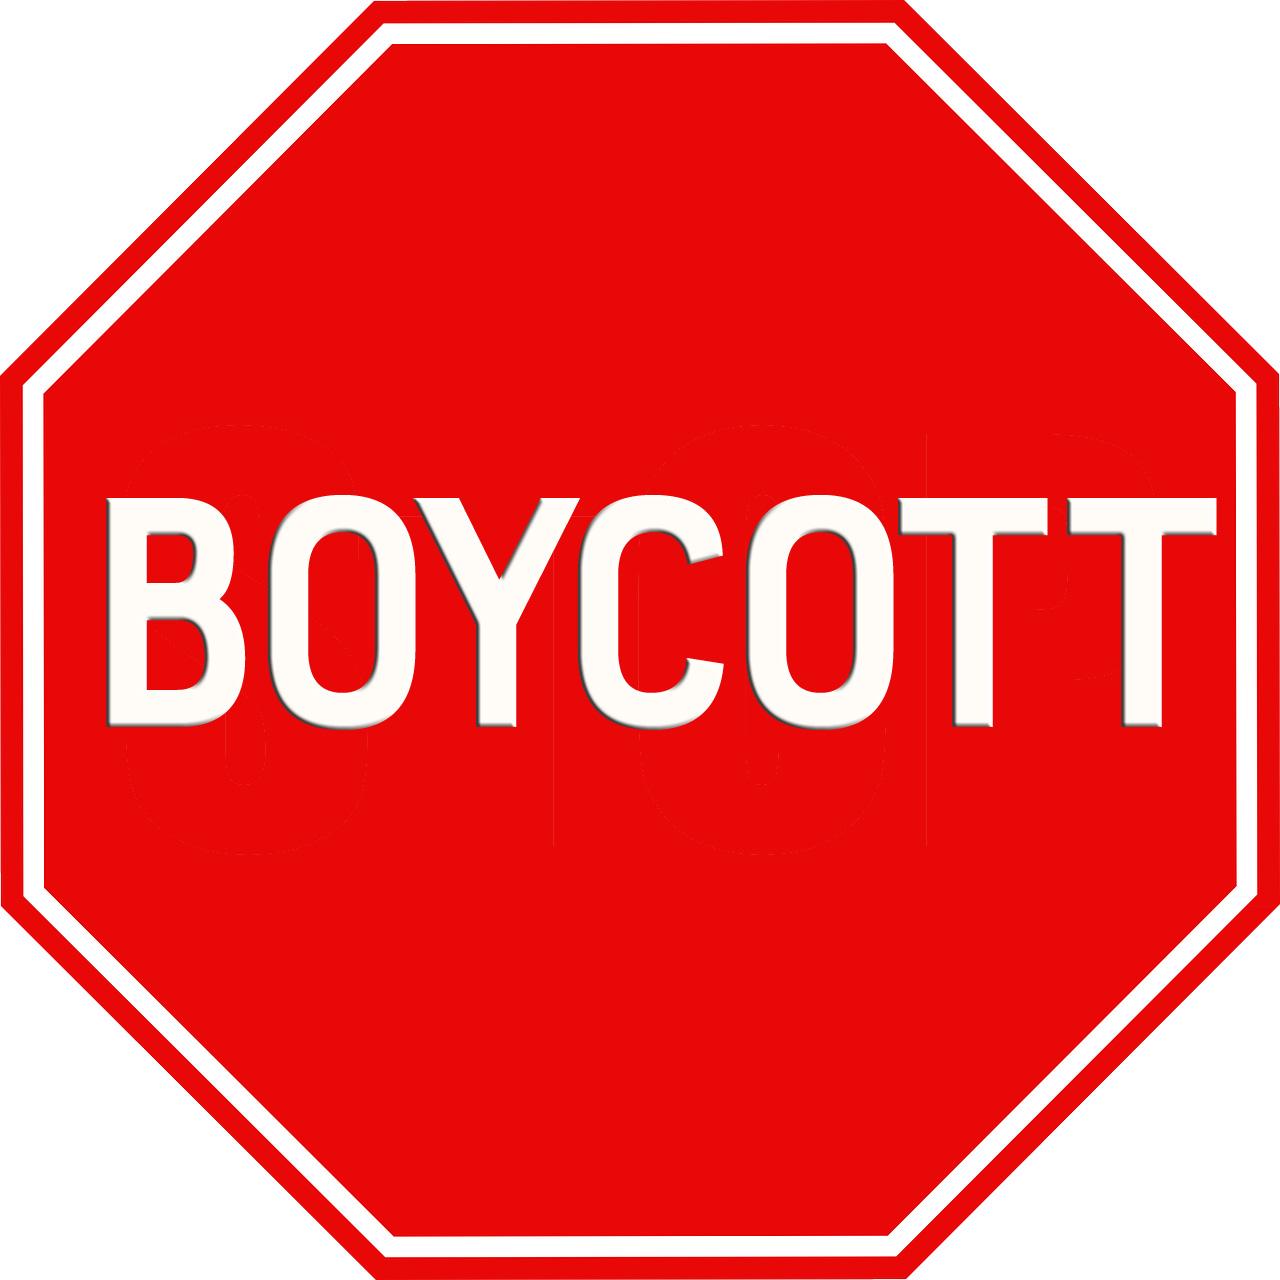 boycott_stop_sign.jpg